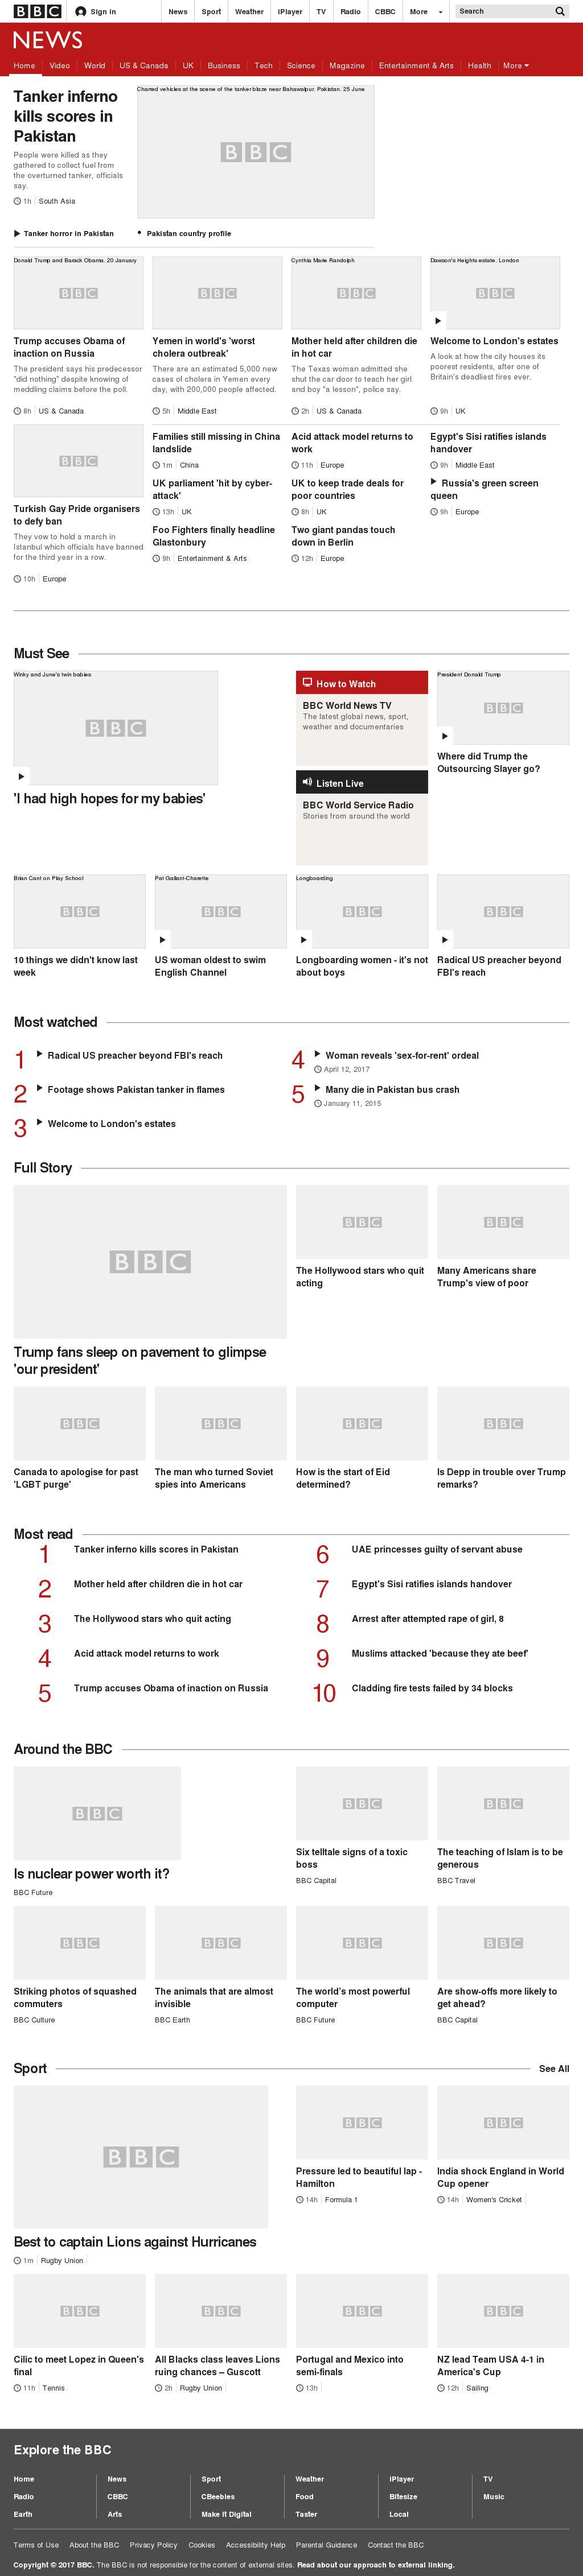 BBC at Sunday June 25, 2017, 8 a.m. UTC